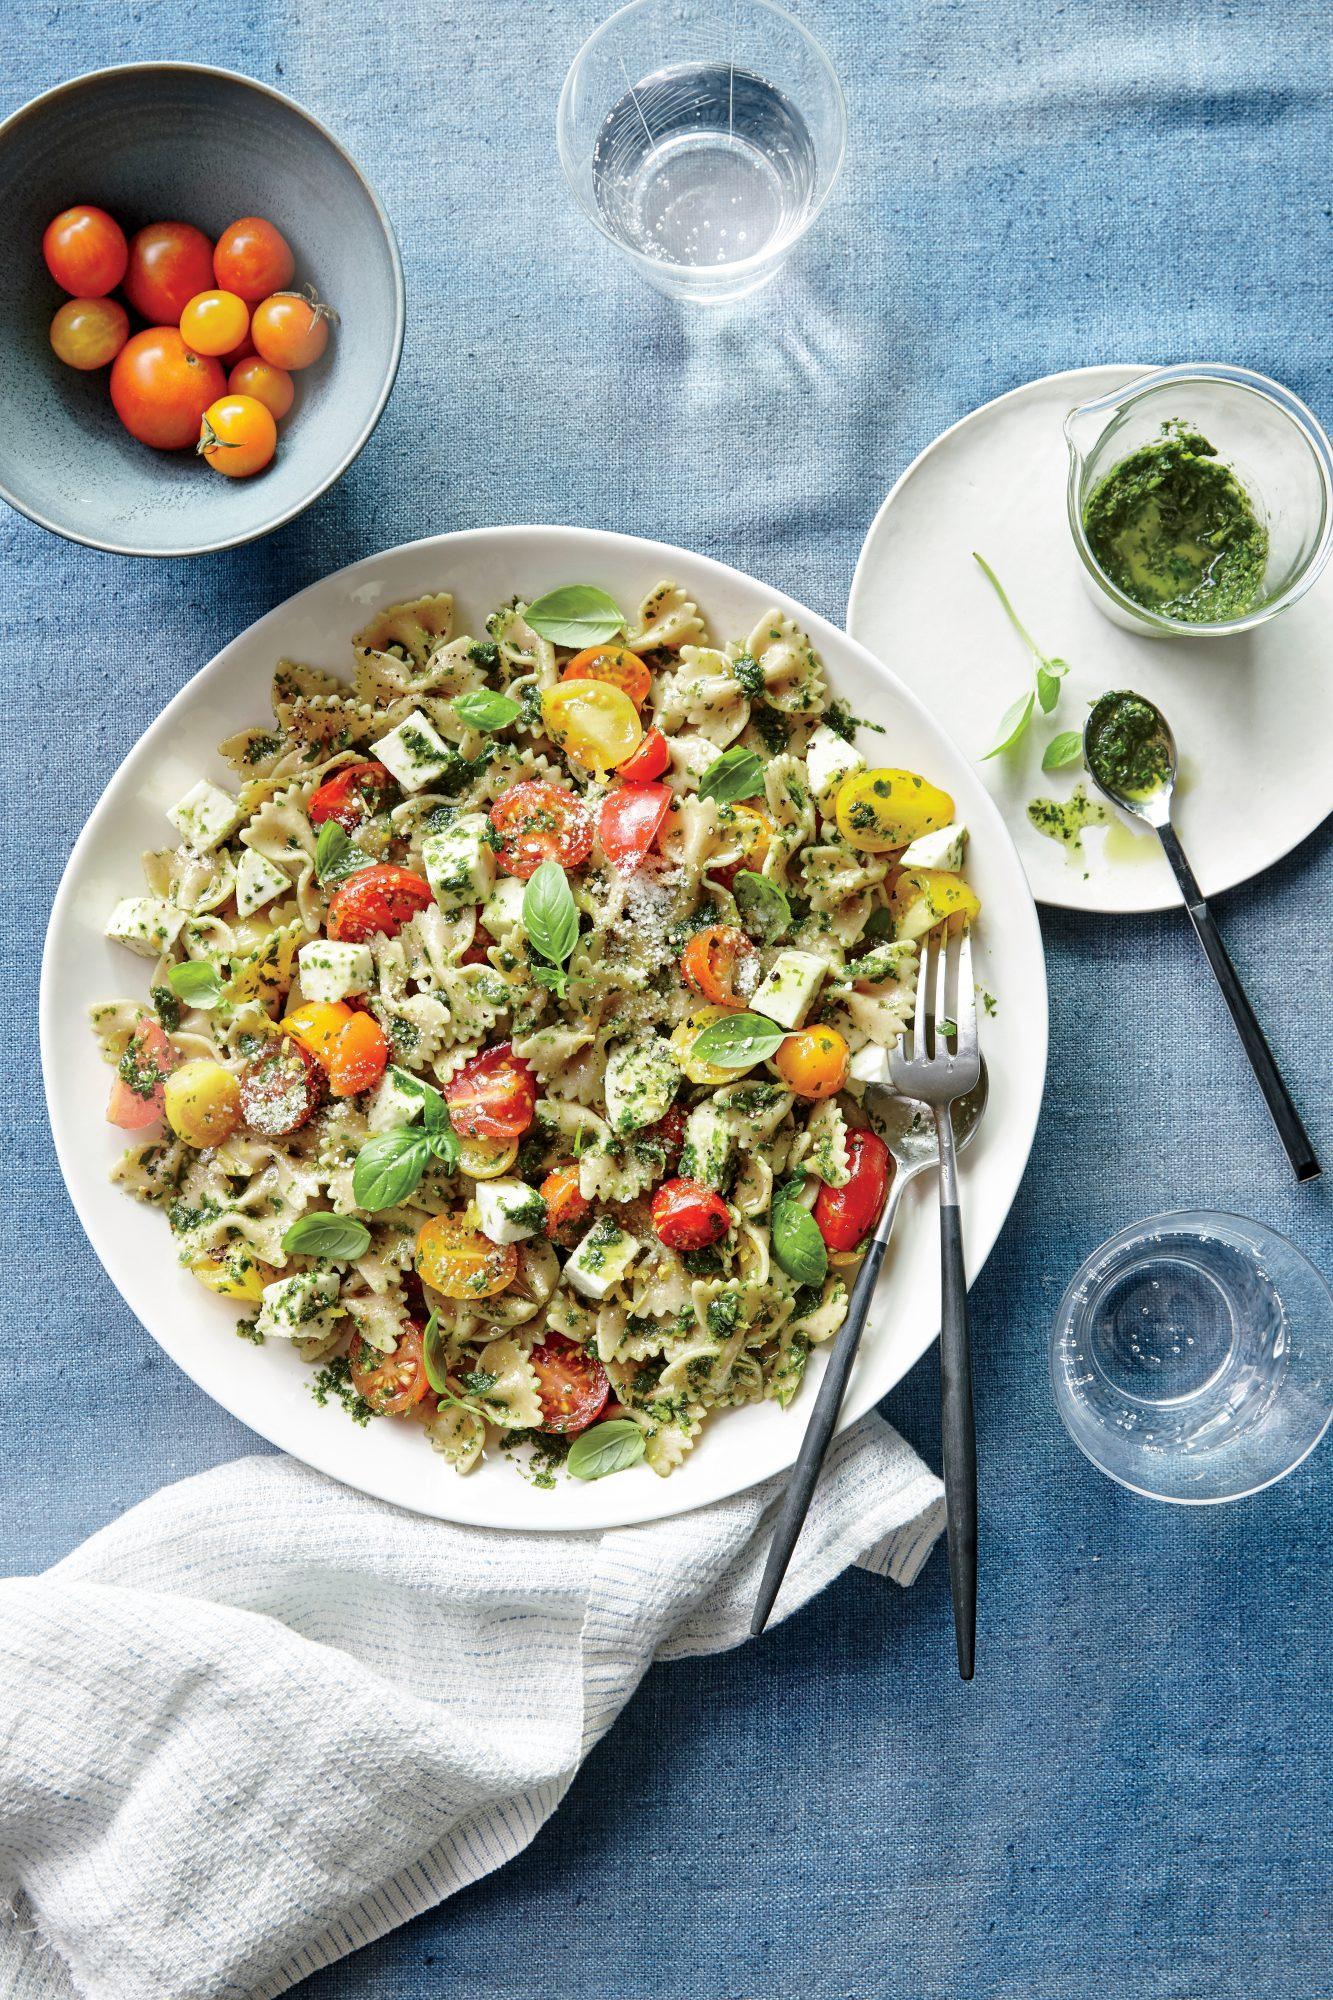 Pesto Pasta Salad with Tomatoes and Mozzarella